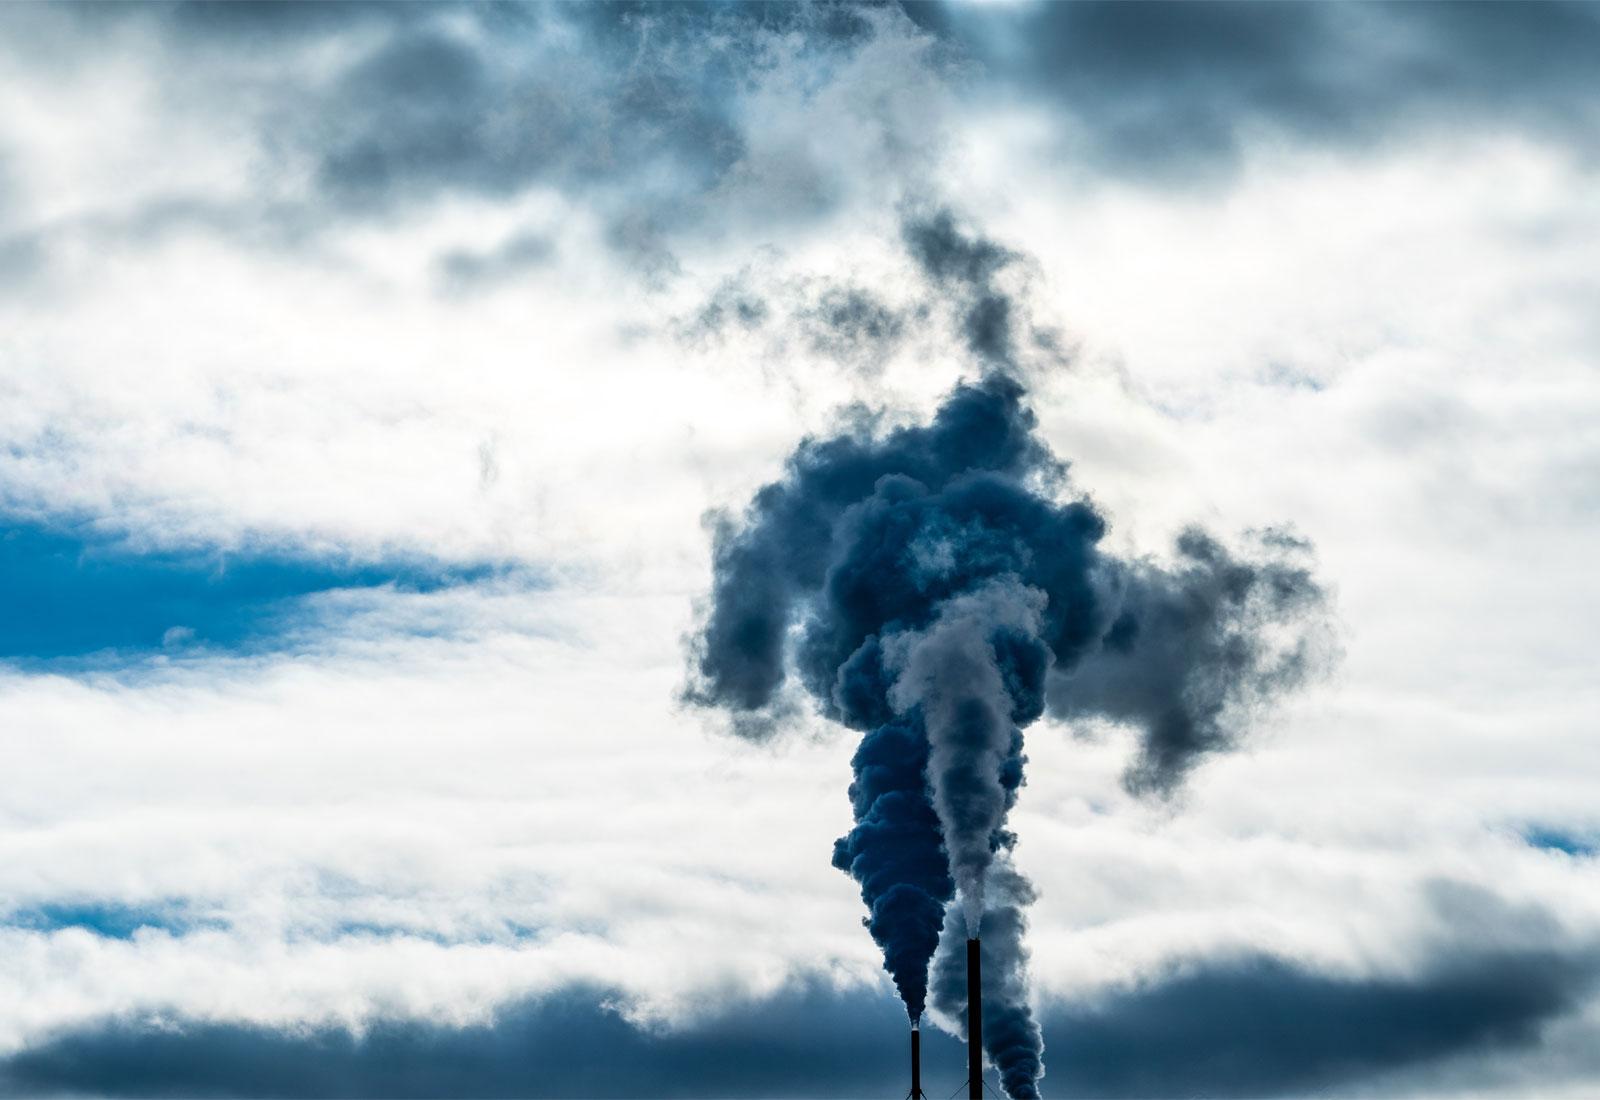 Smokestacks and smoke against a cloudy sky